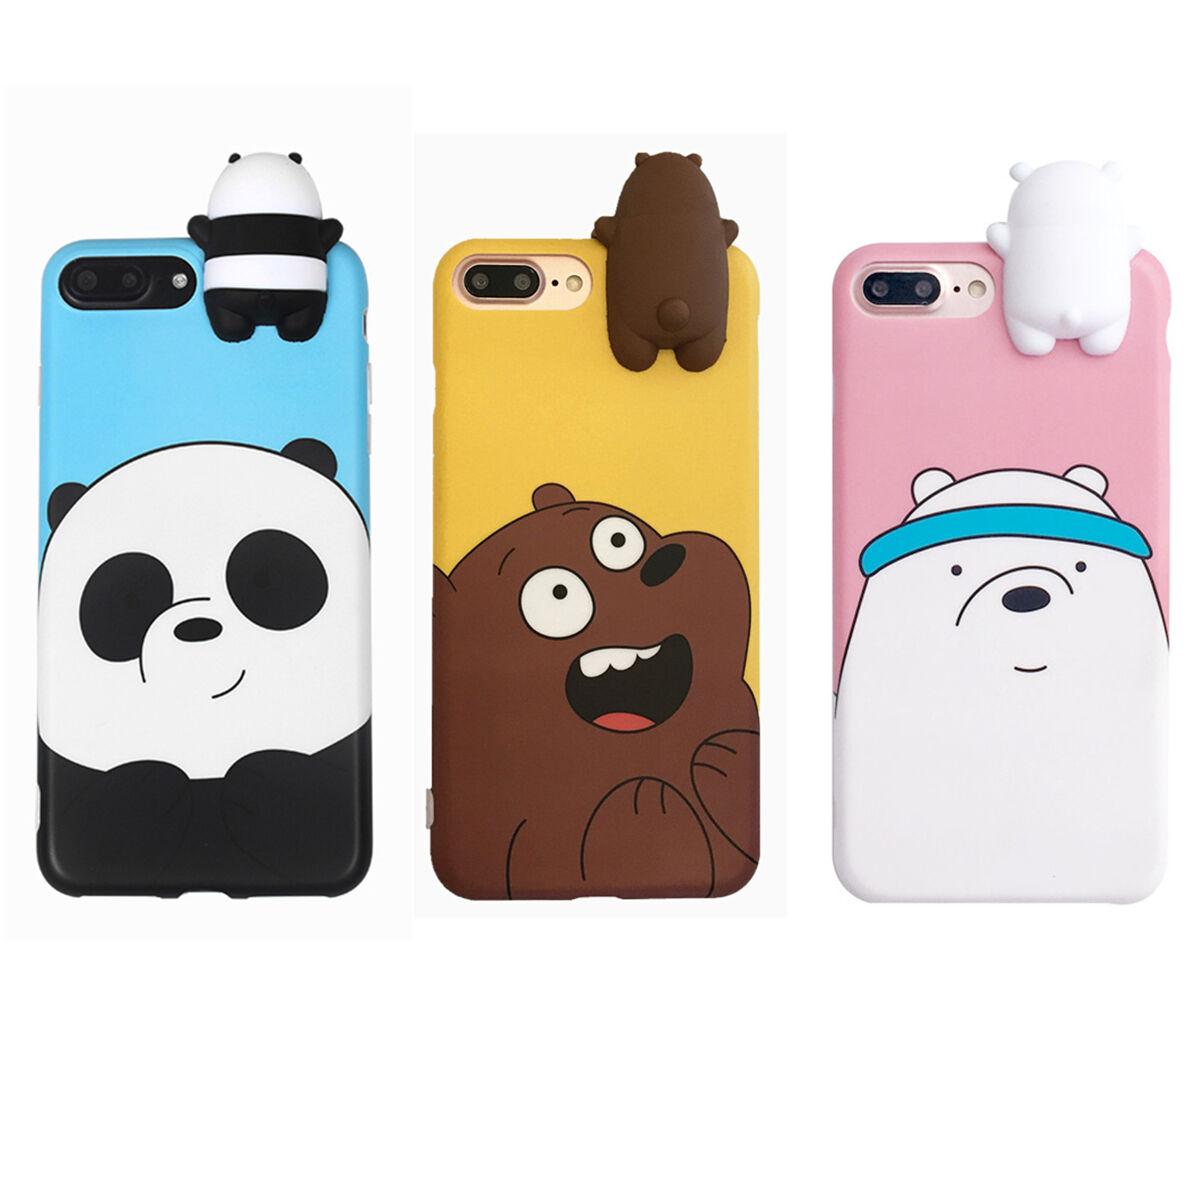 Creative Iphone  Cases